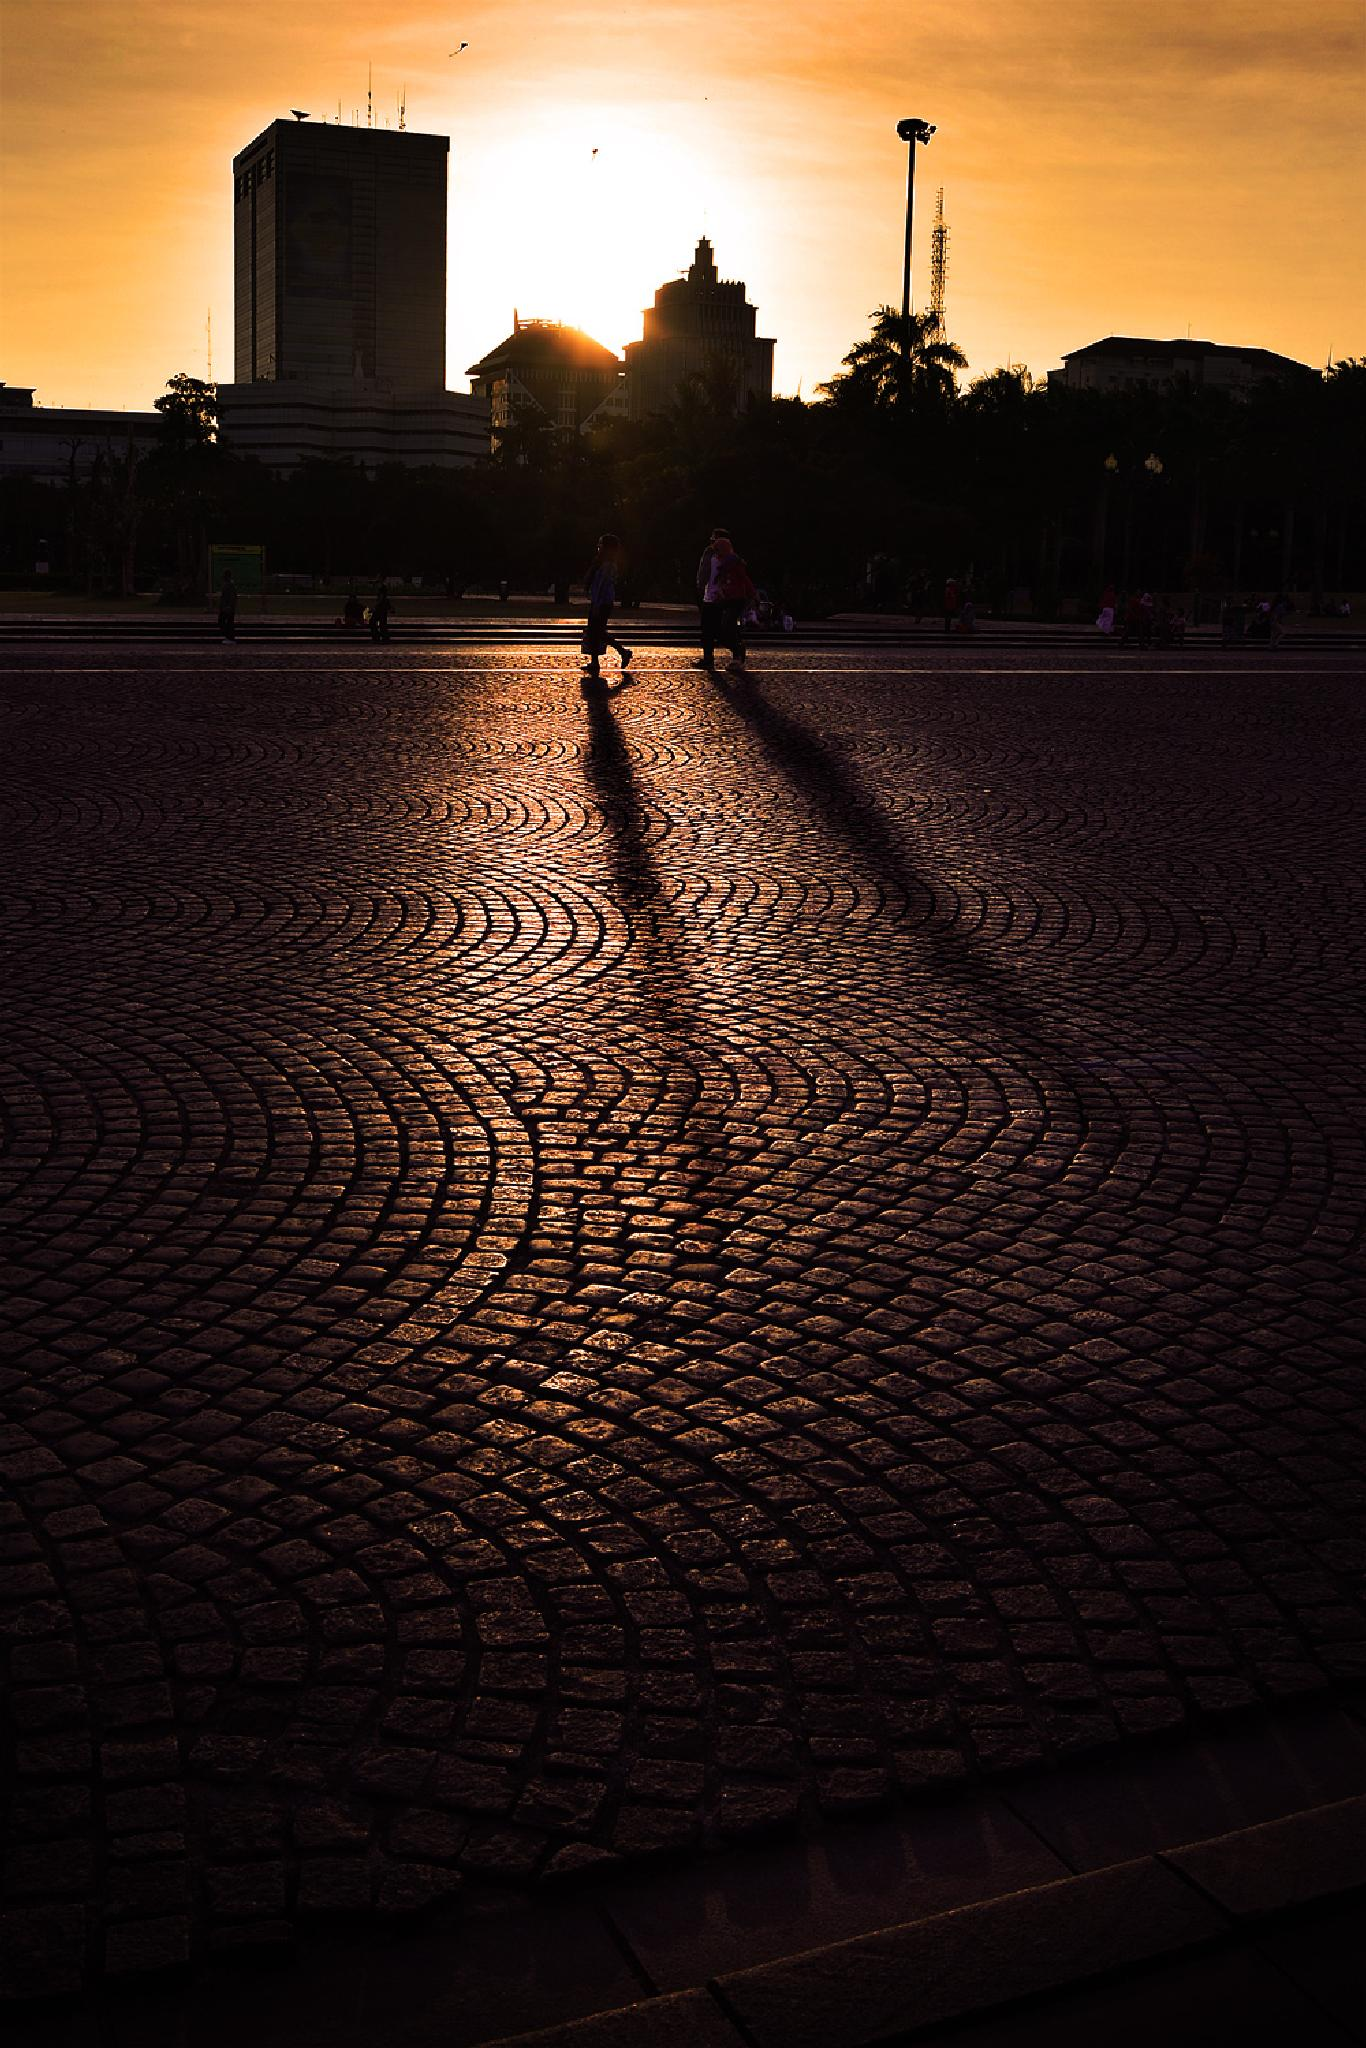 Between light and shadow by MemenSaputra Mms